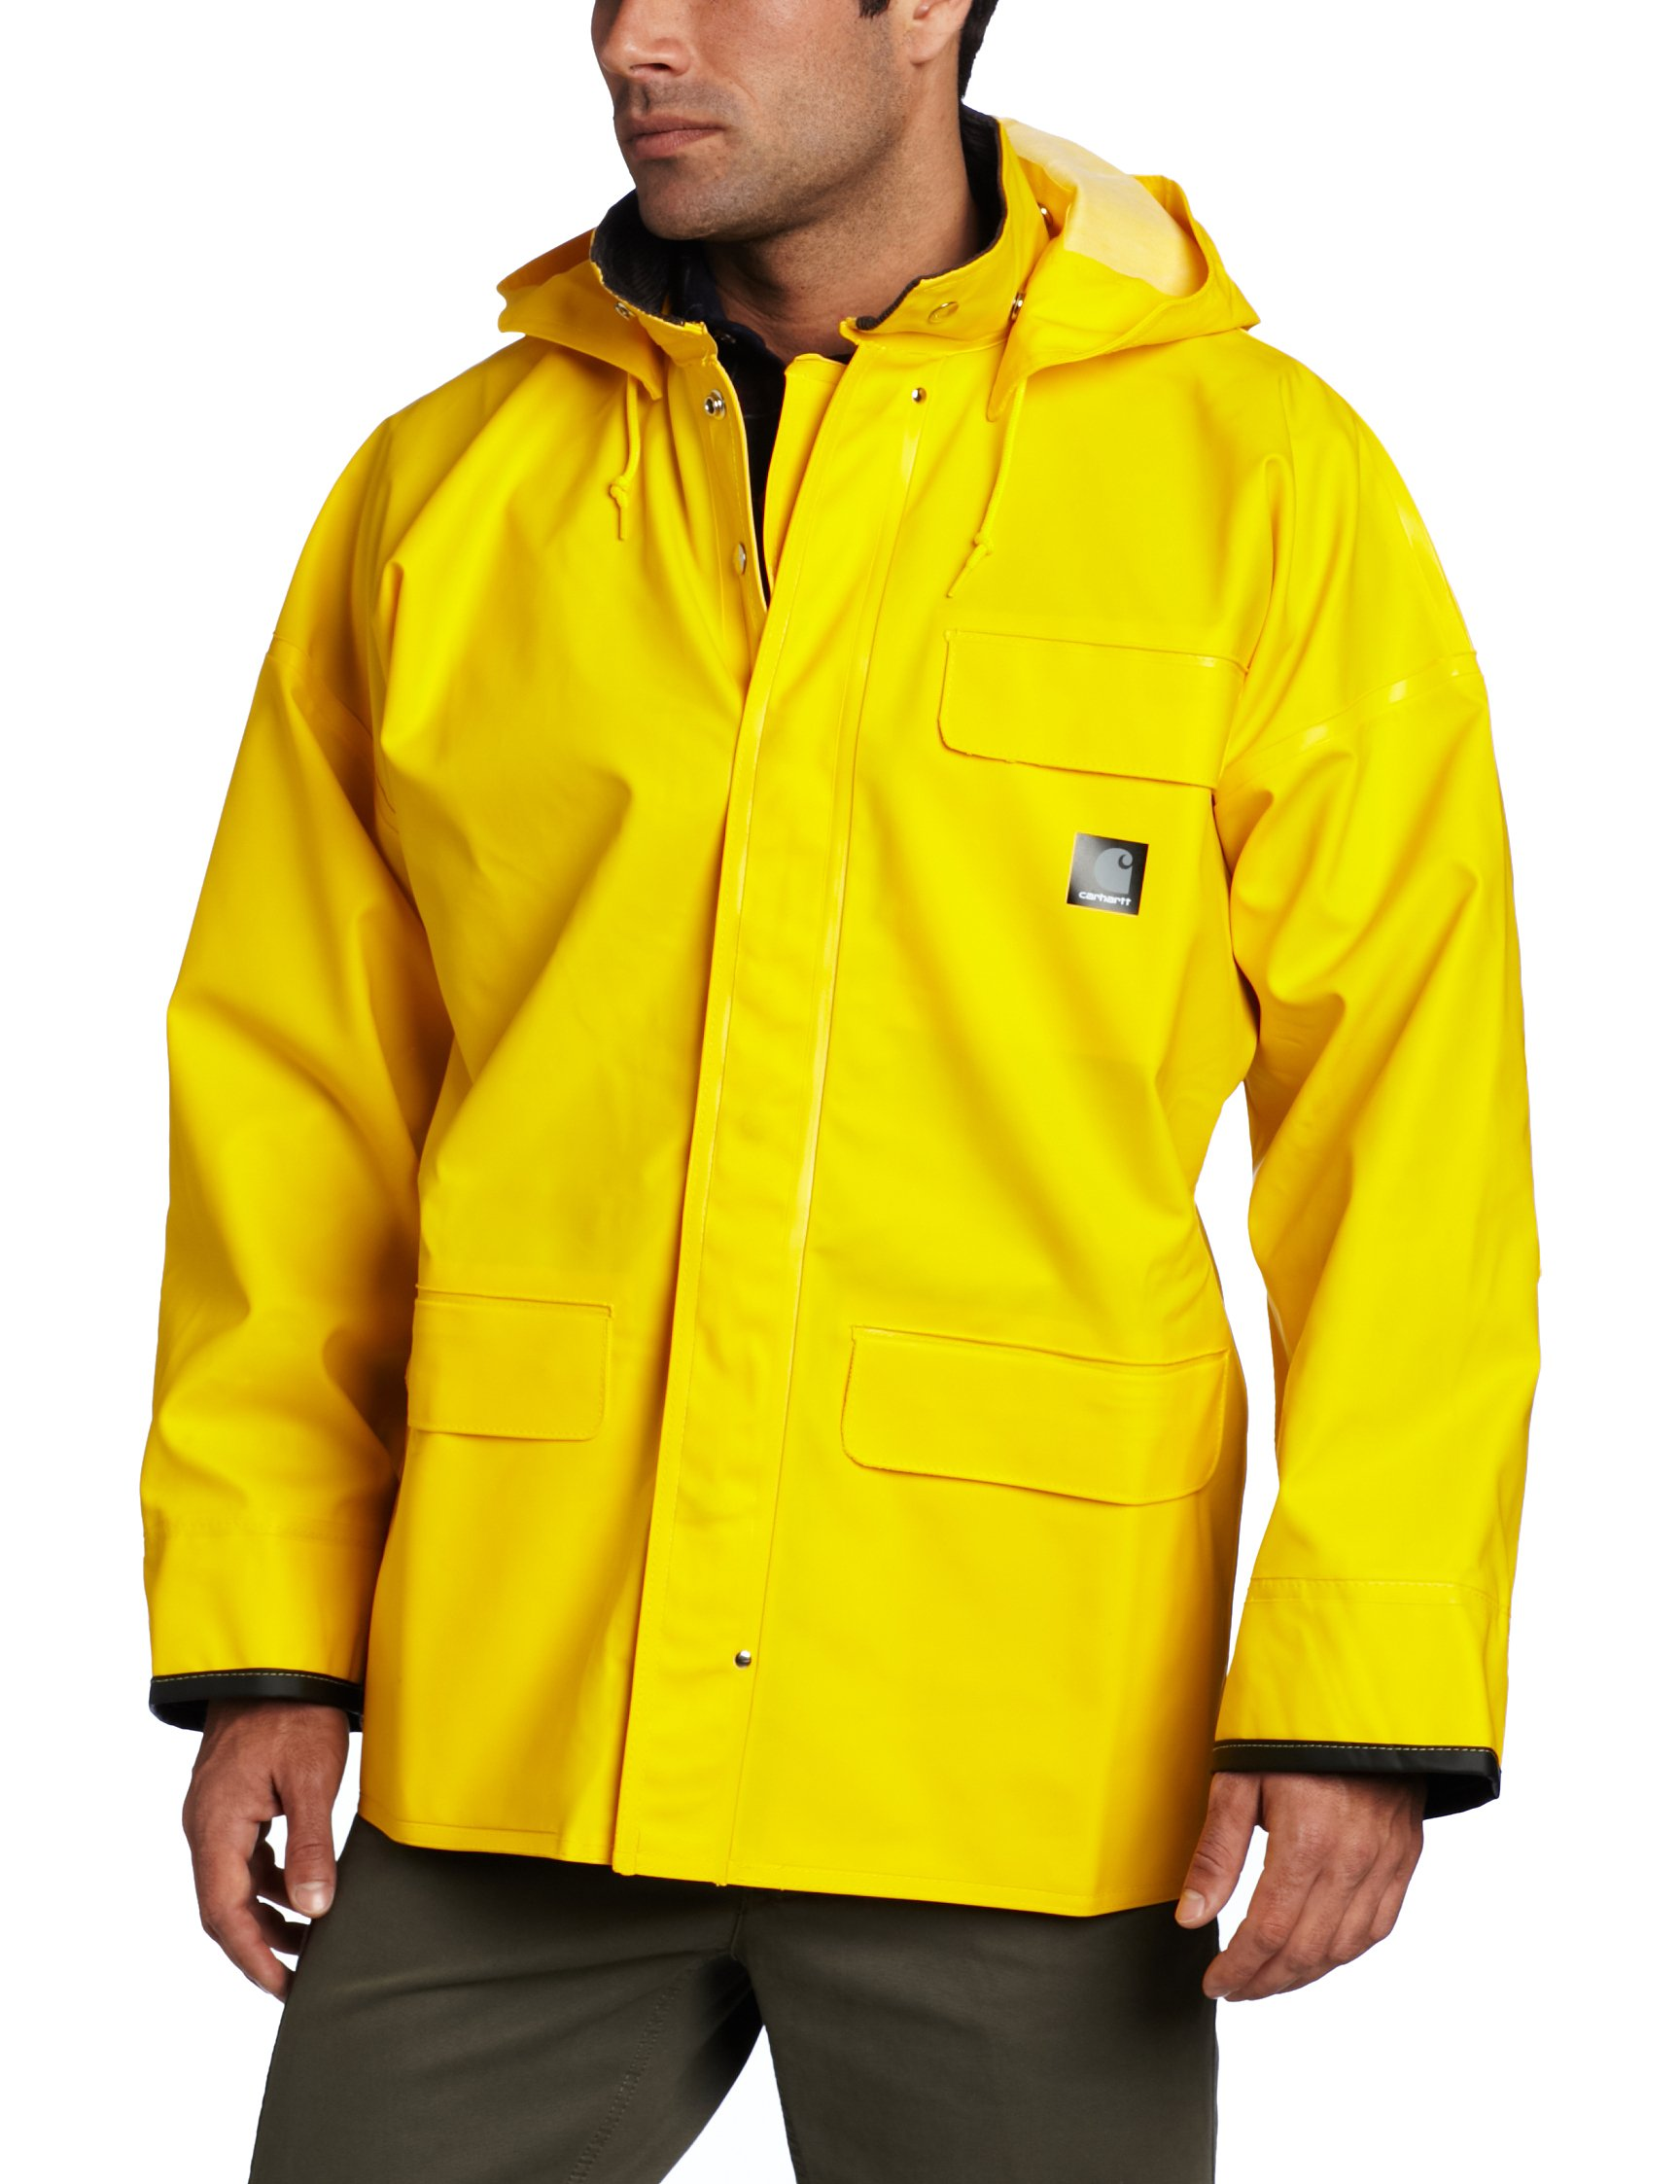 Carhartt Men's Surrey Coat,Yellow,Small Regular by Carhartt